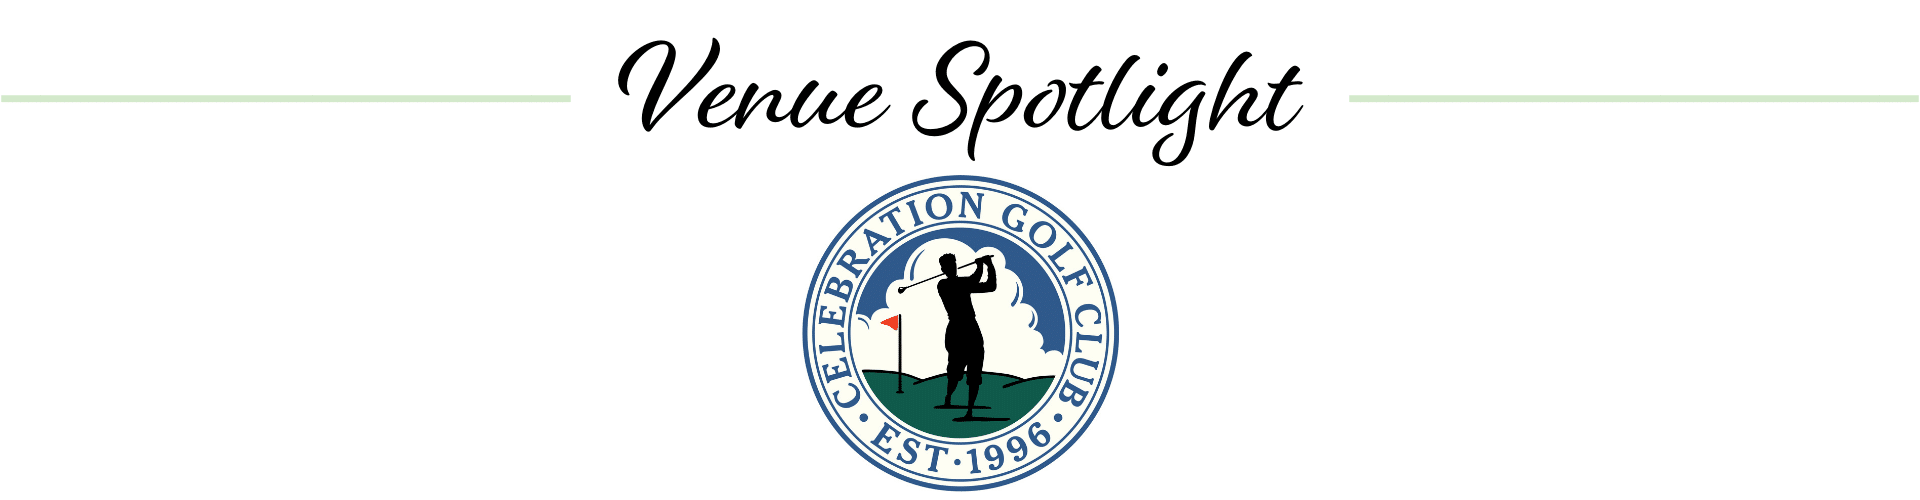 Celebration Golf Club logo